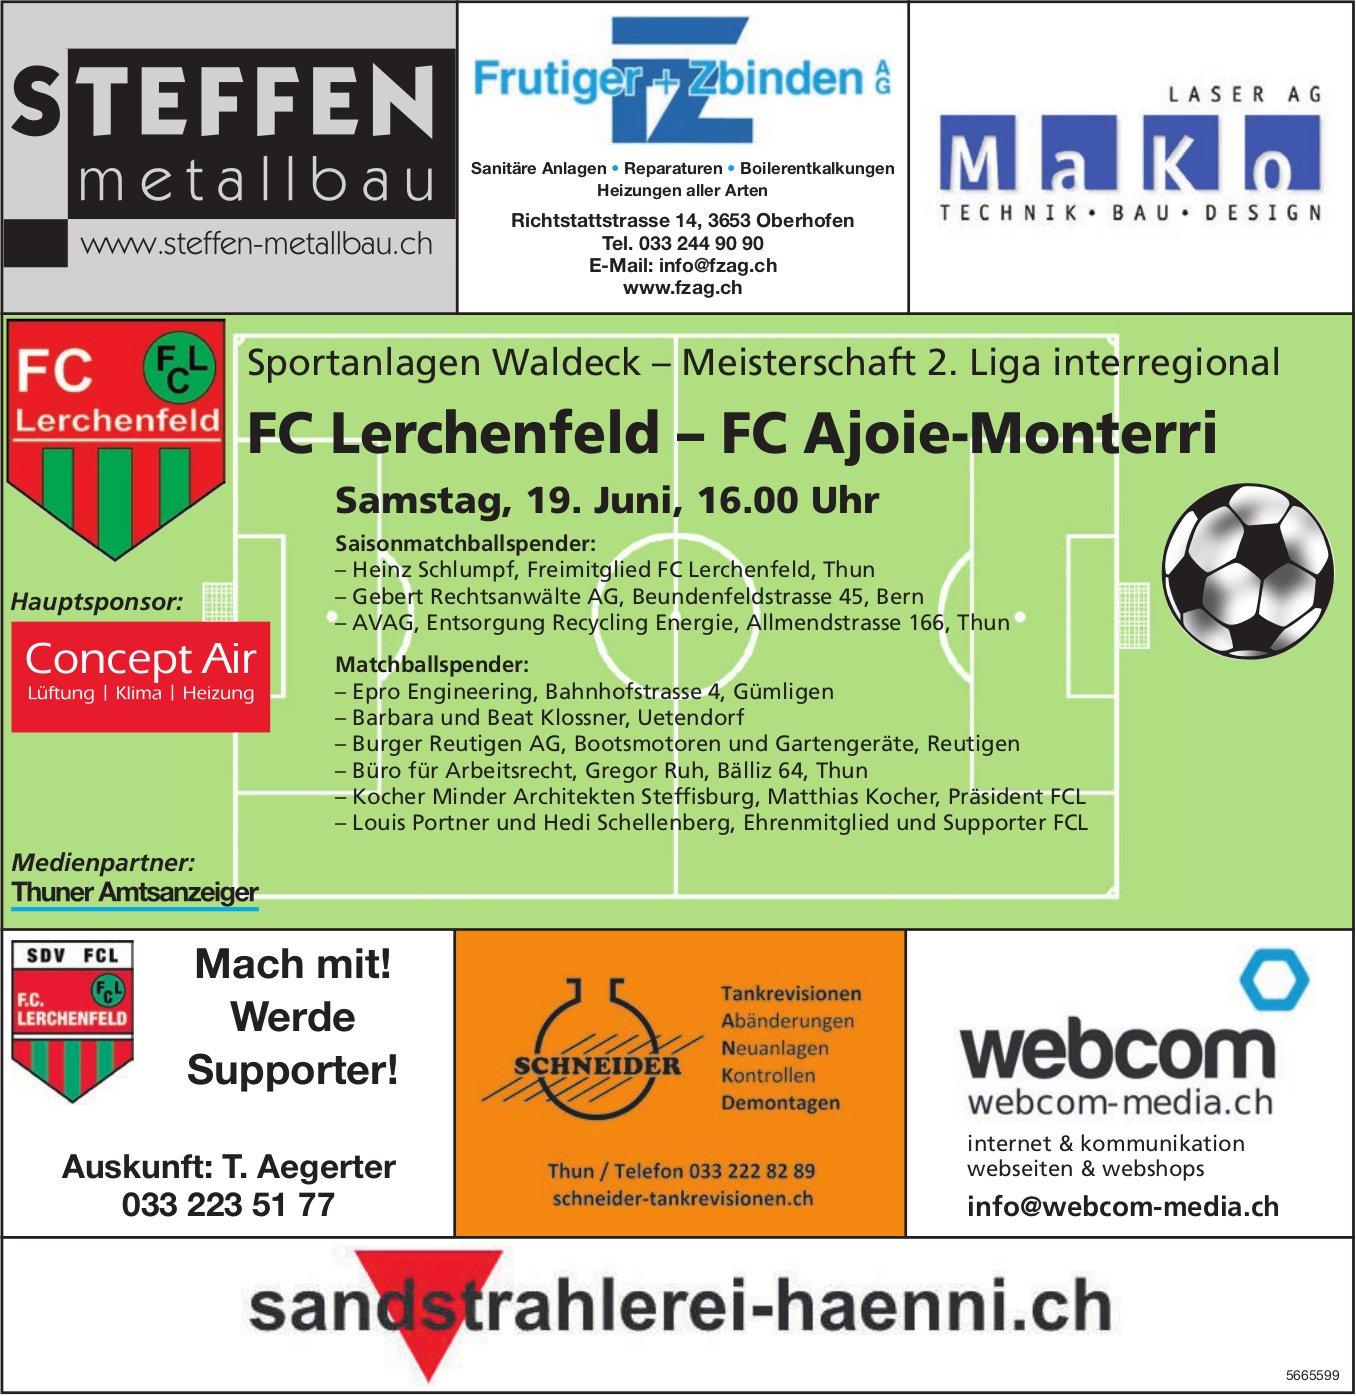 FC Lerchenfeld vs. FC Ajoie-Monterri, 19. Juni, Sportanlagen Waldeck